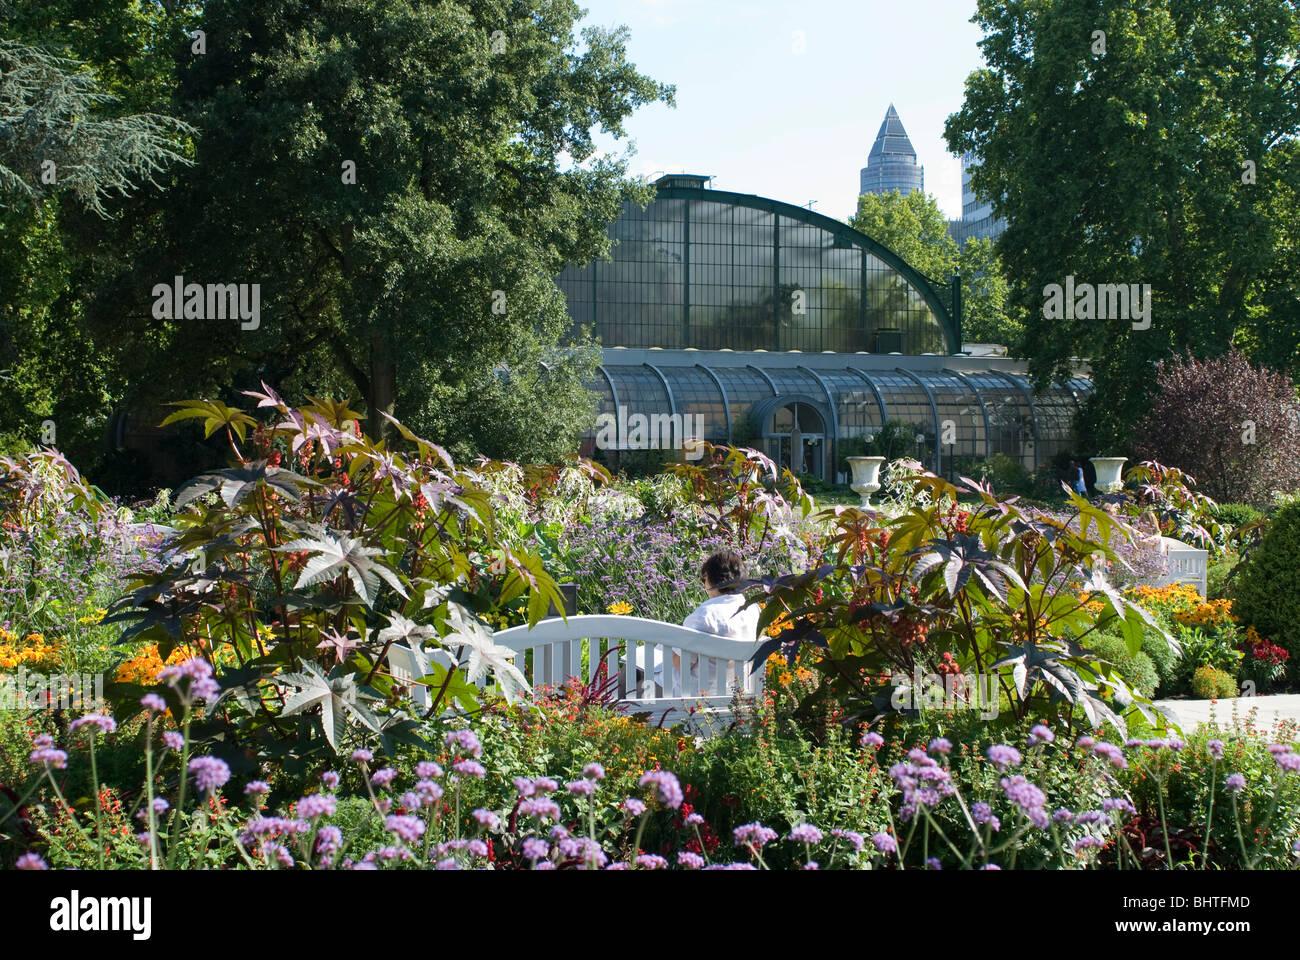 palmengarten botanical garden in frankfurt tropicarium and skyline stock photo royalty free. Black Bedroom Furniture Sets. Home Design Ideas